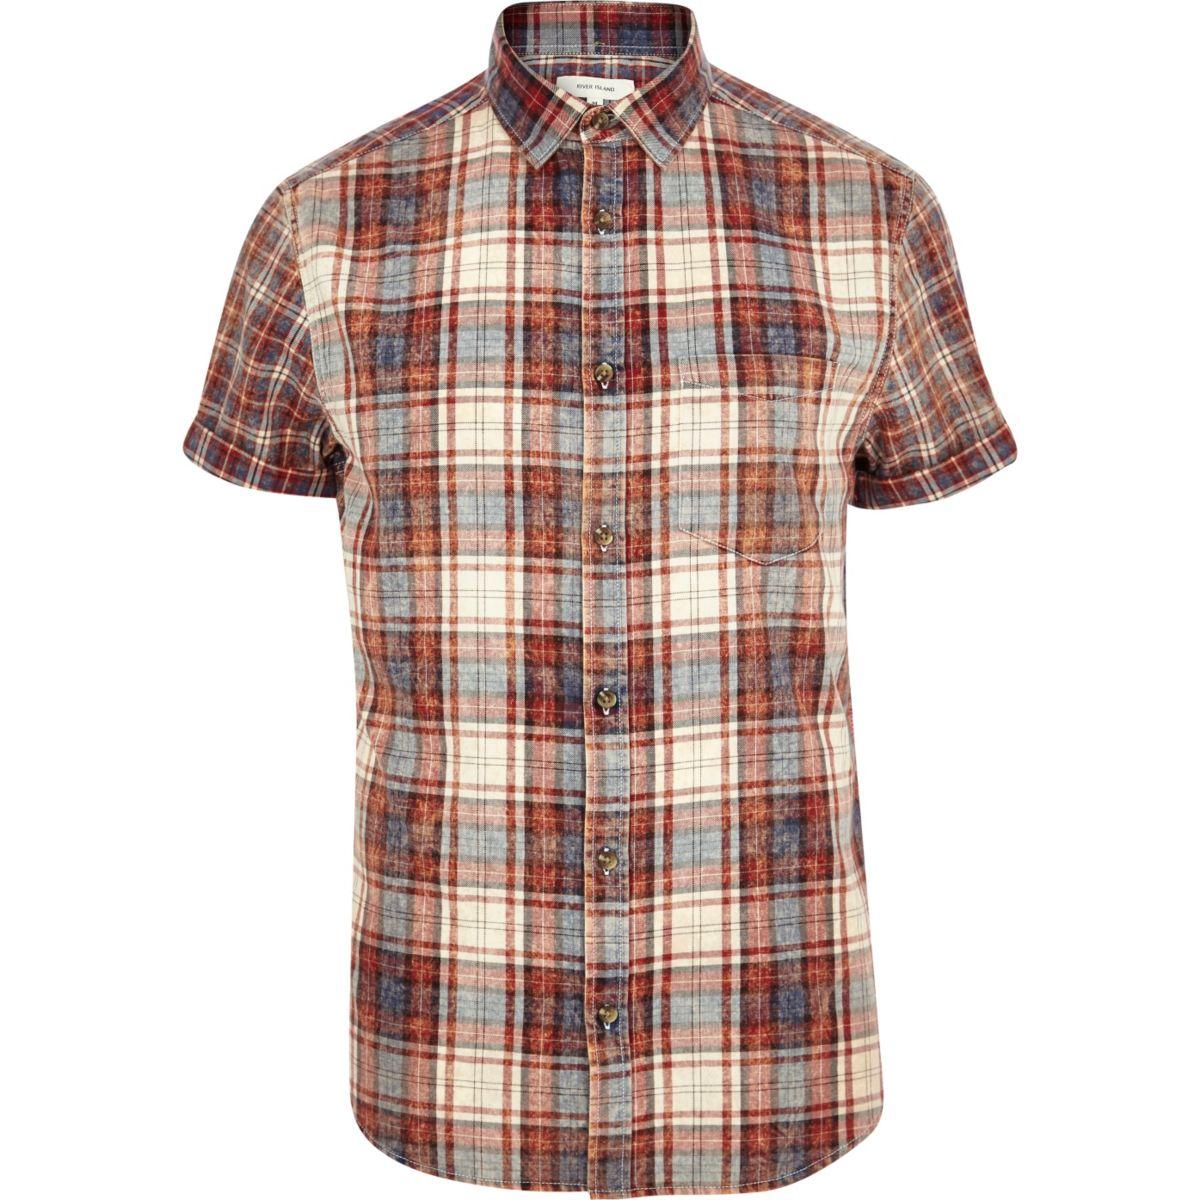 Red check short sleeve shirt